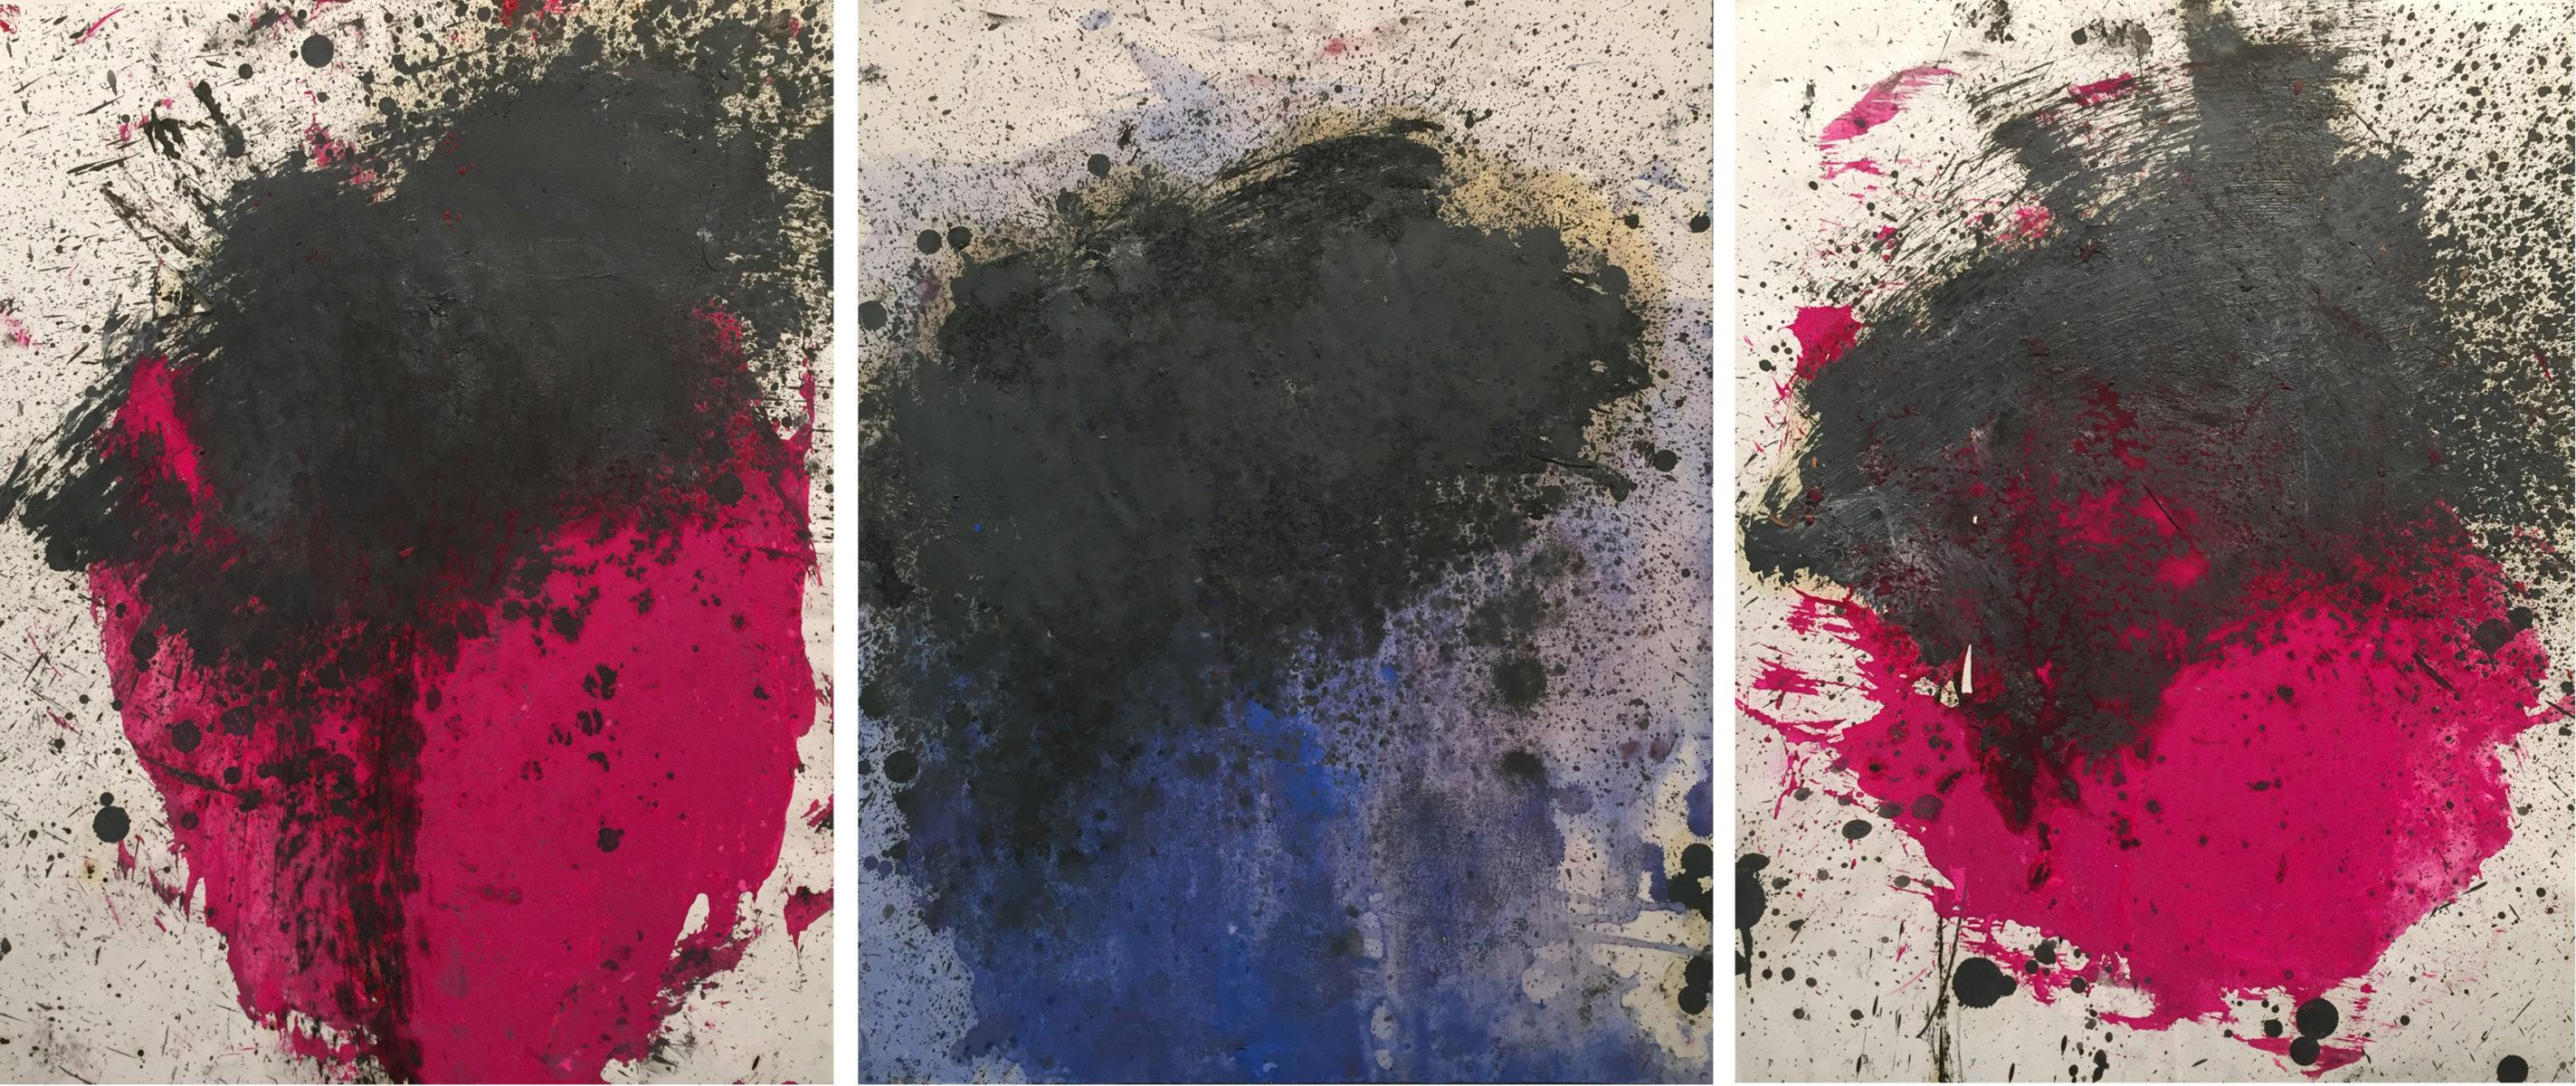 MARC FELD 2014 TERRITOIRE 2  Huile sur papier 150 x 130 cm